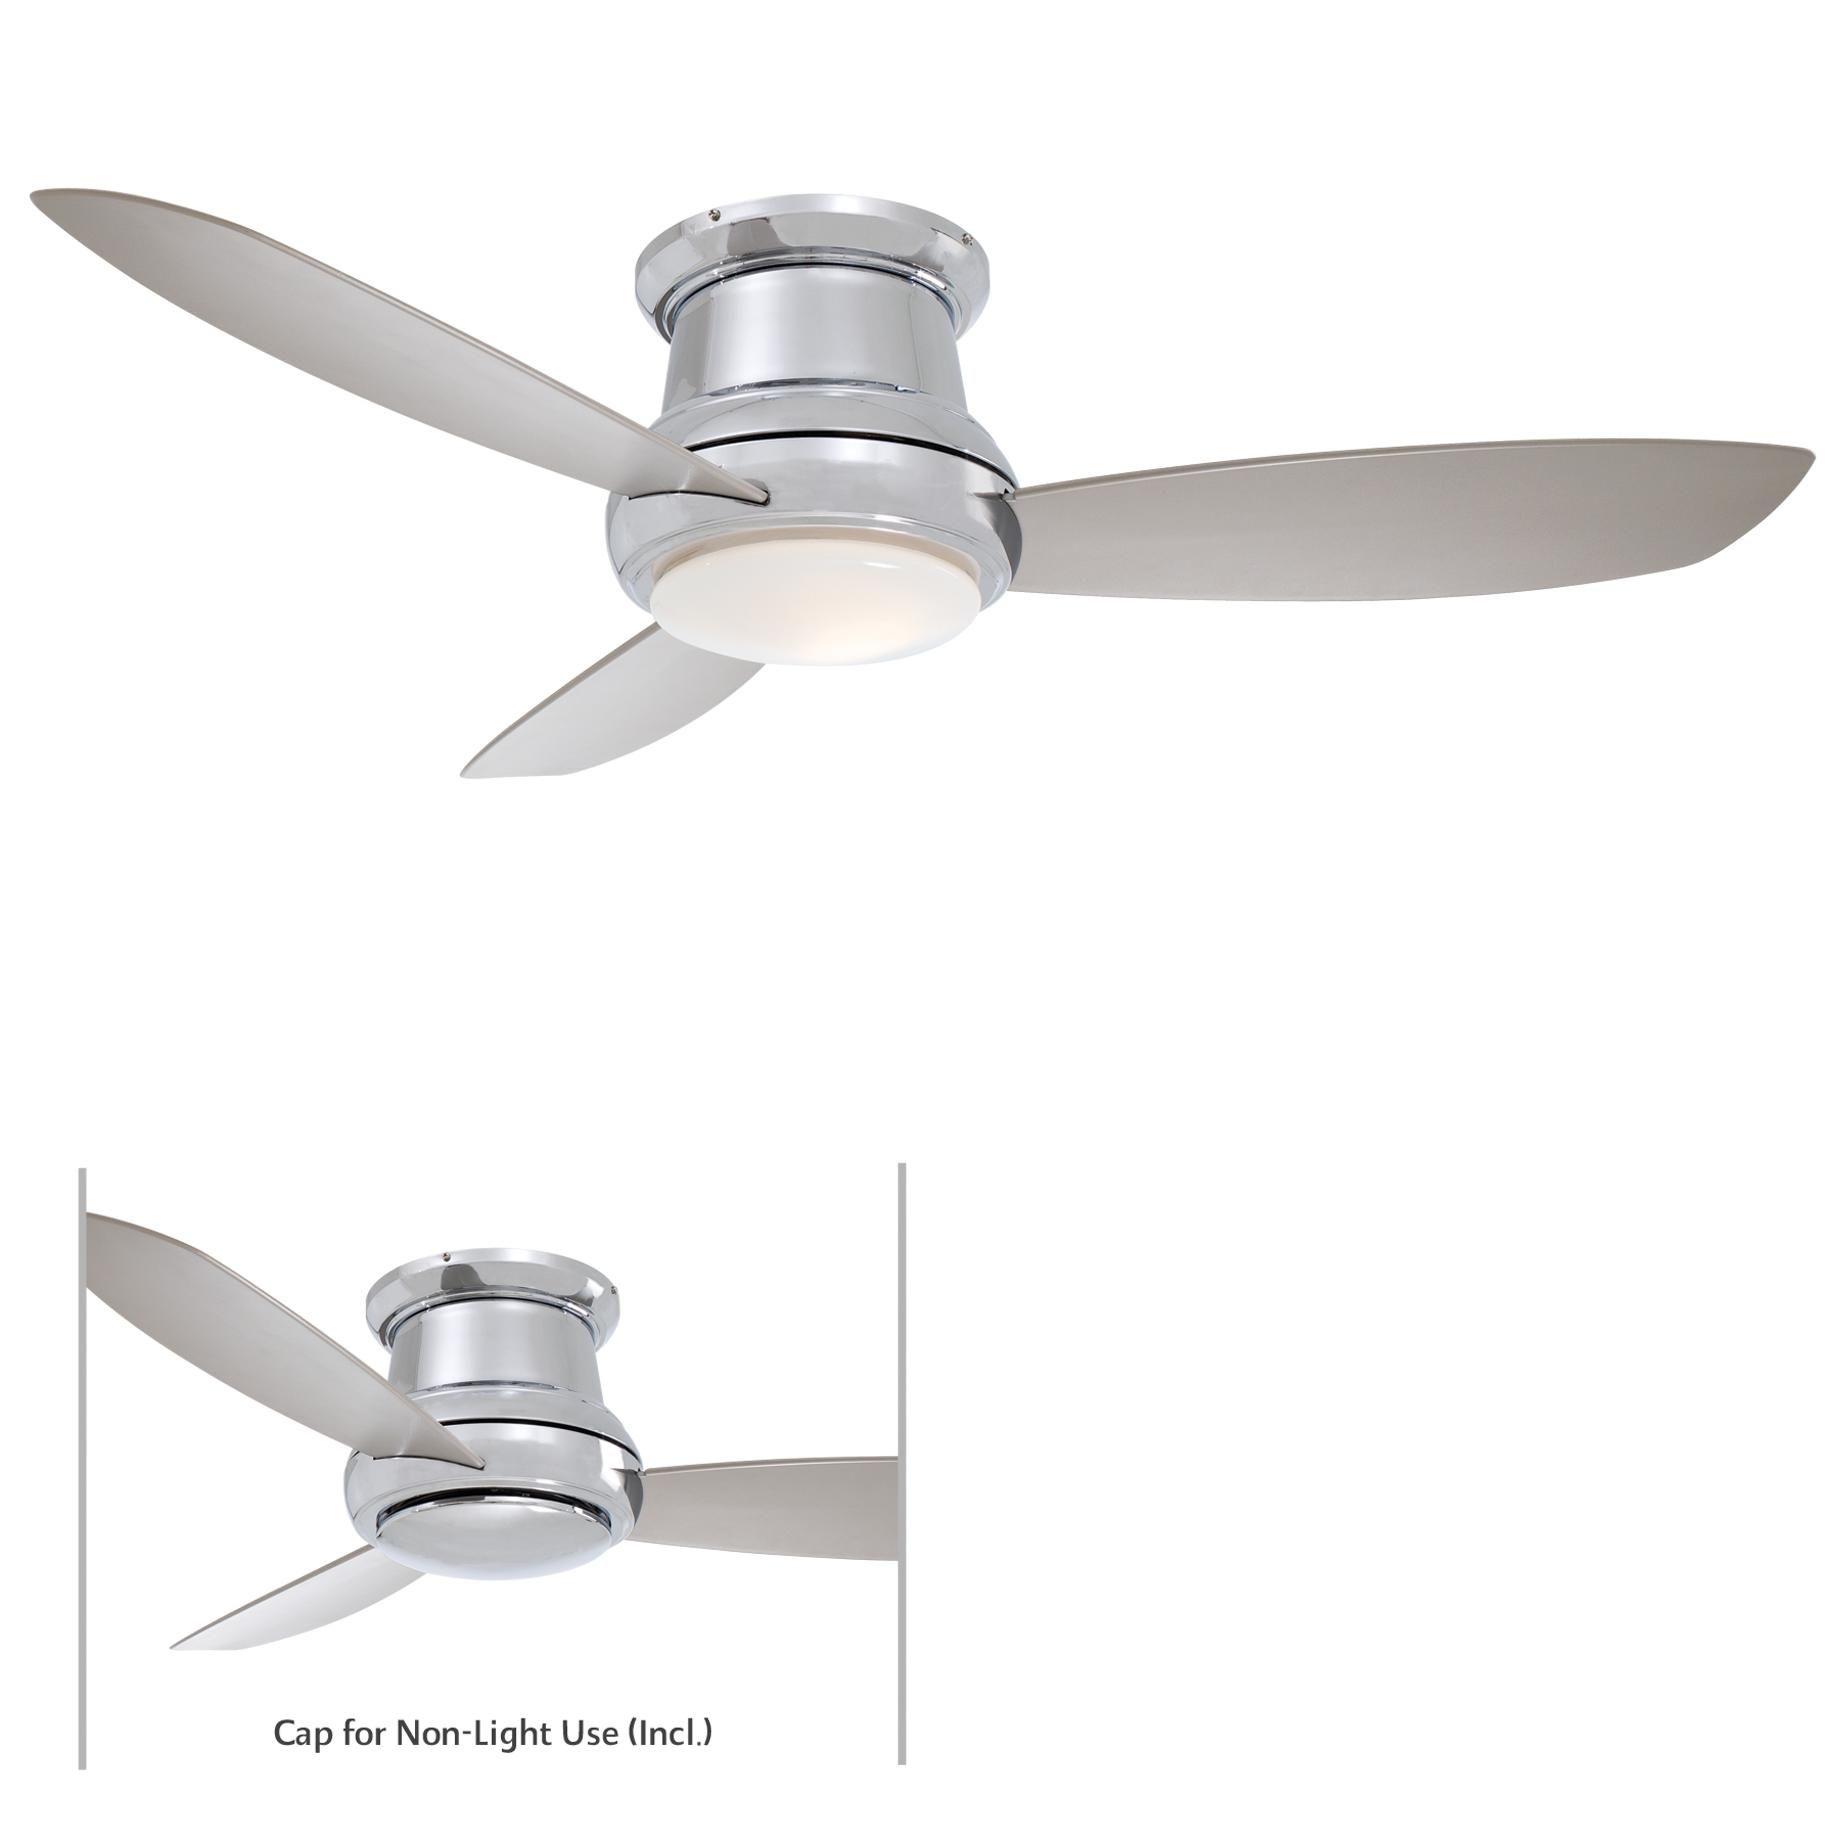 Minka Aire Concept II 52 F519 PN Airflow Rating 6300 CFM Cubic